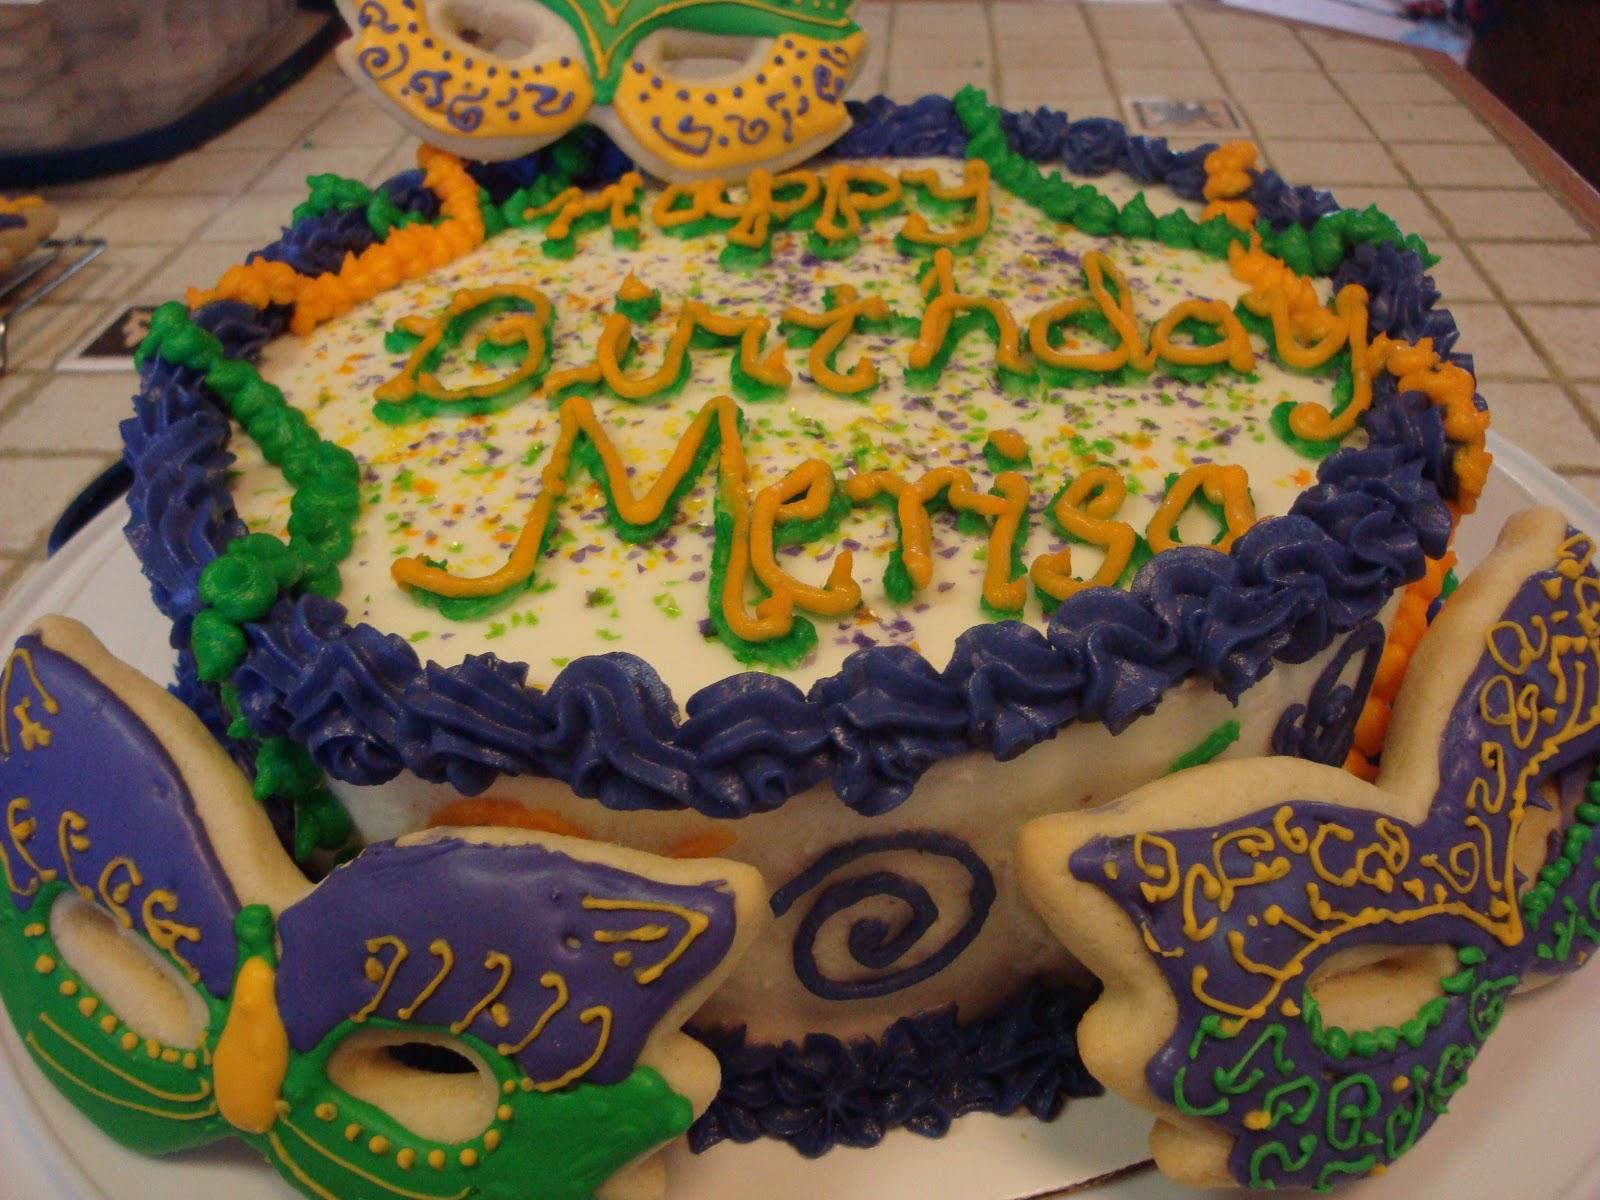 Sugar Cookies Dbl Layer Cake Mardi Gras Birthday All The Way